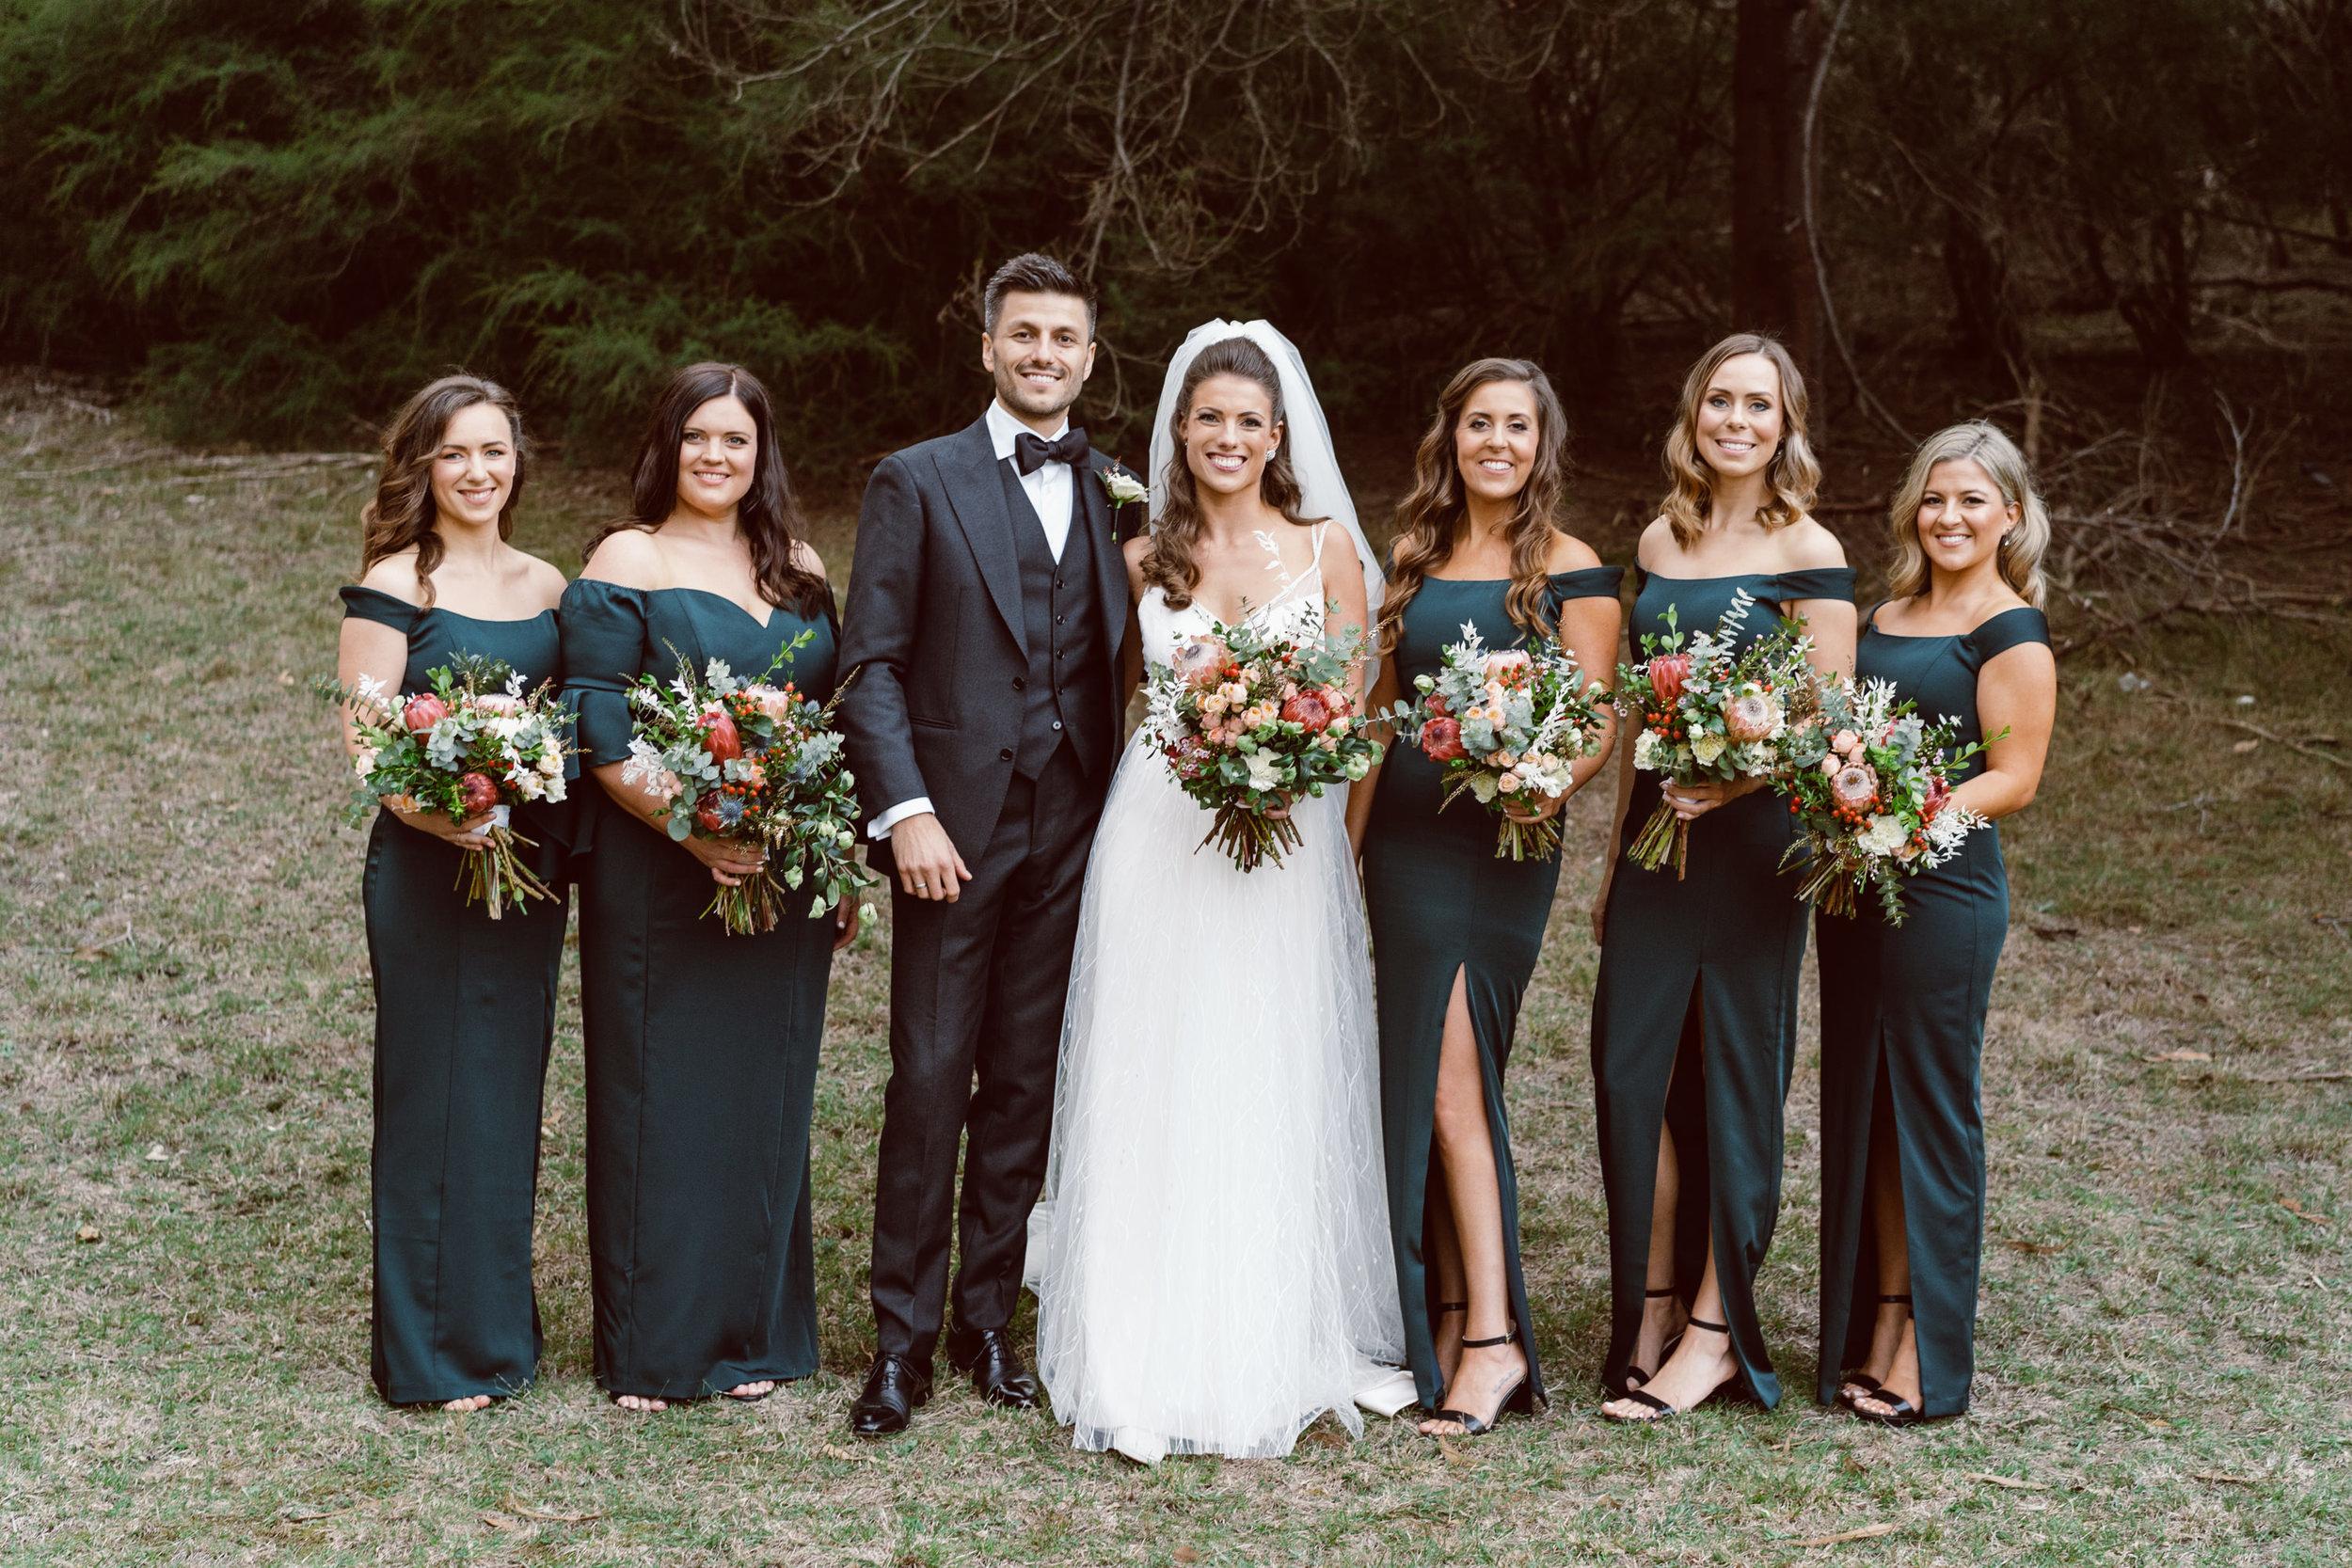 Wedding_Party (13 of 103).jpg